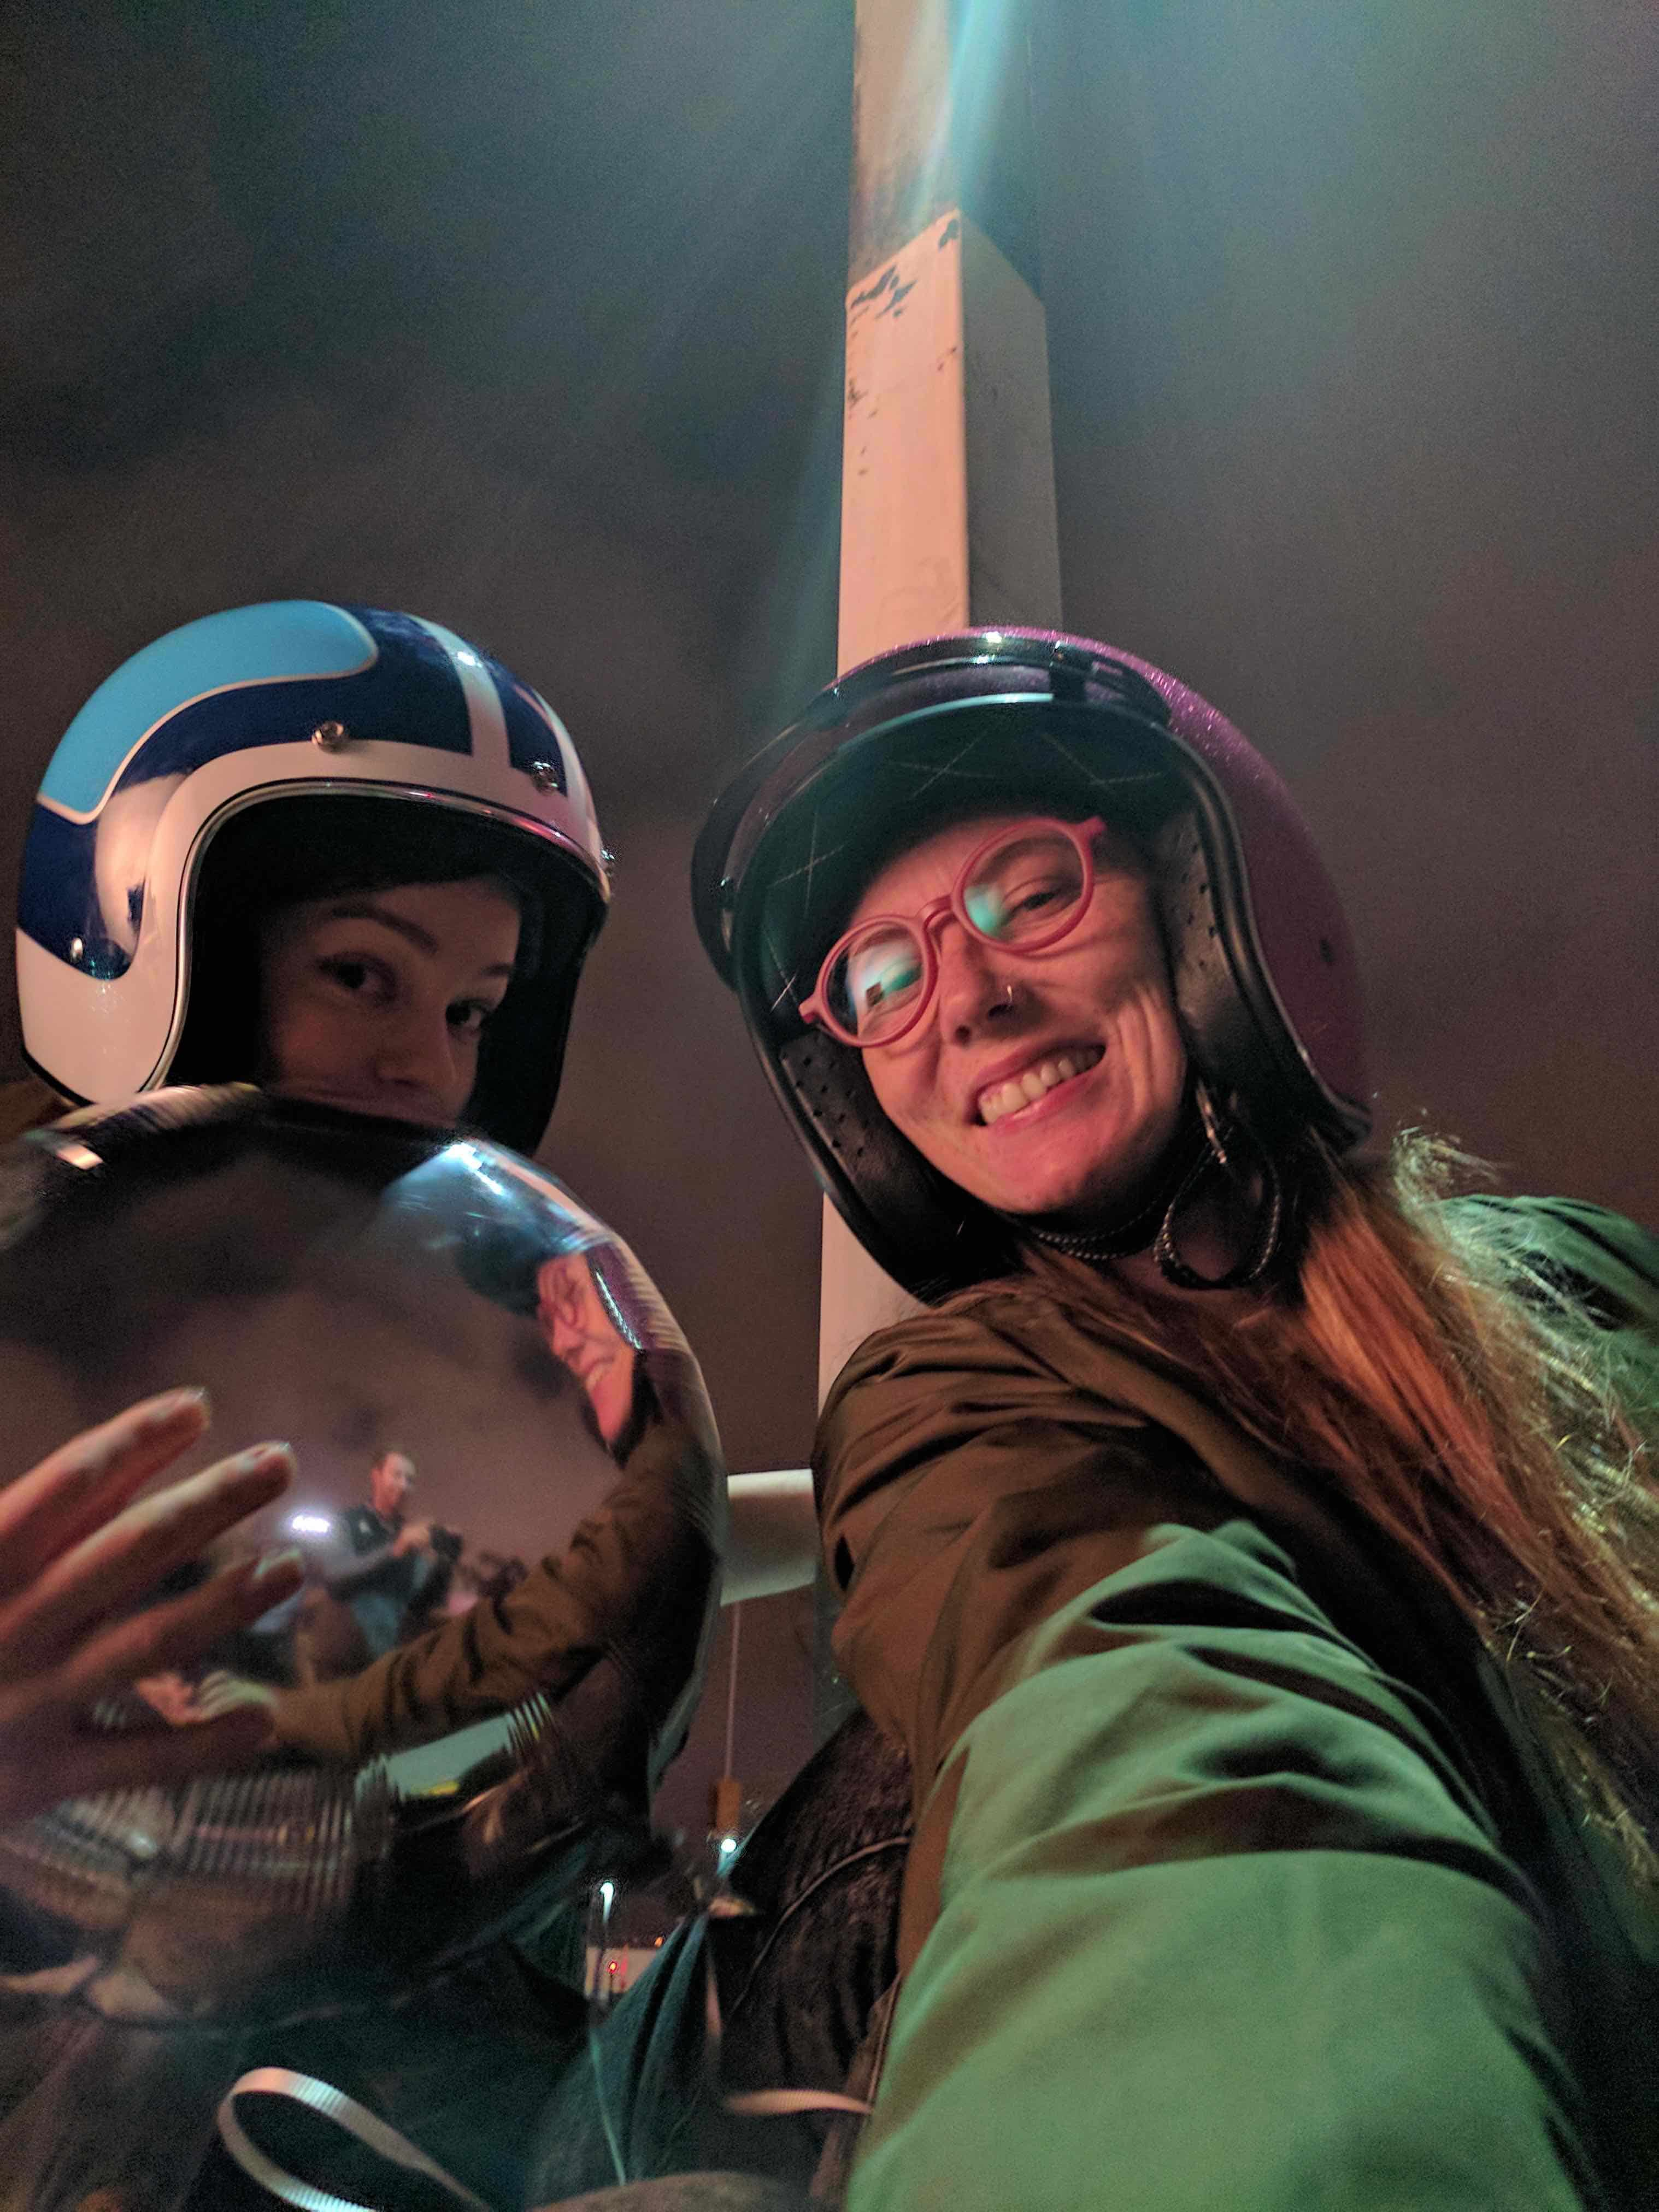 Selfie en basse luminosité